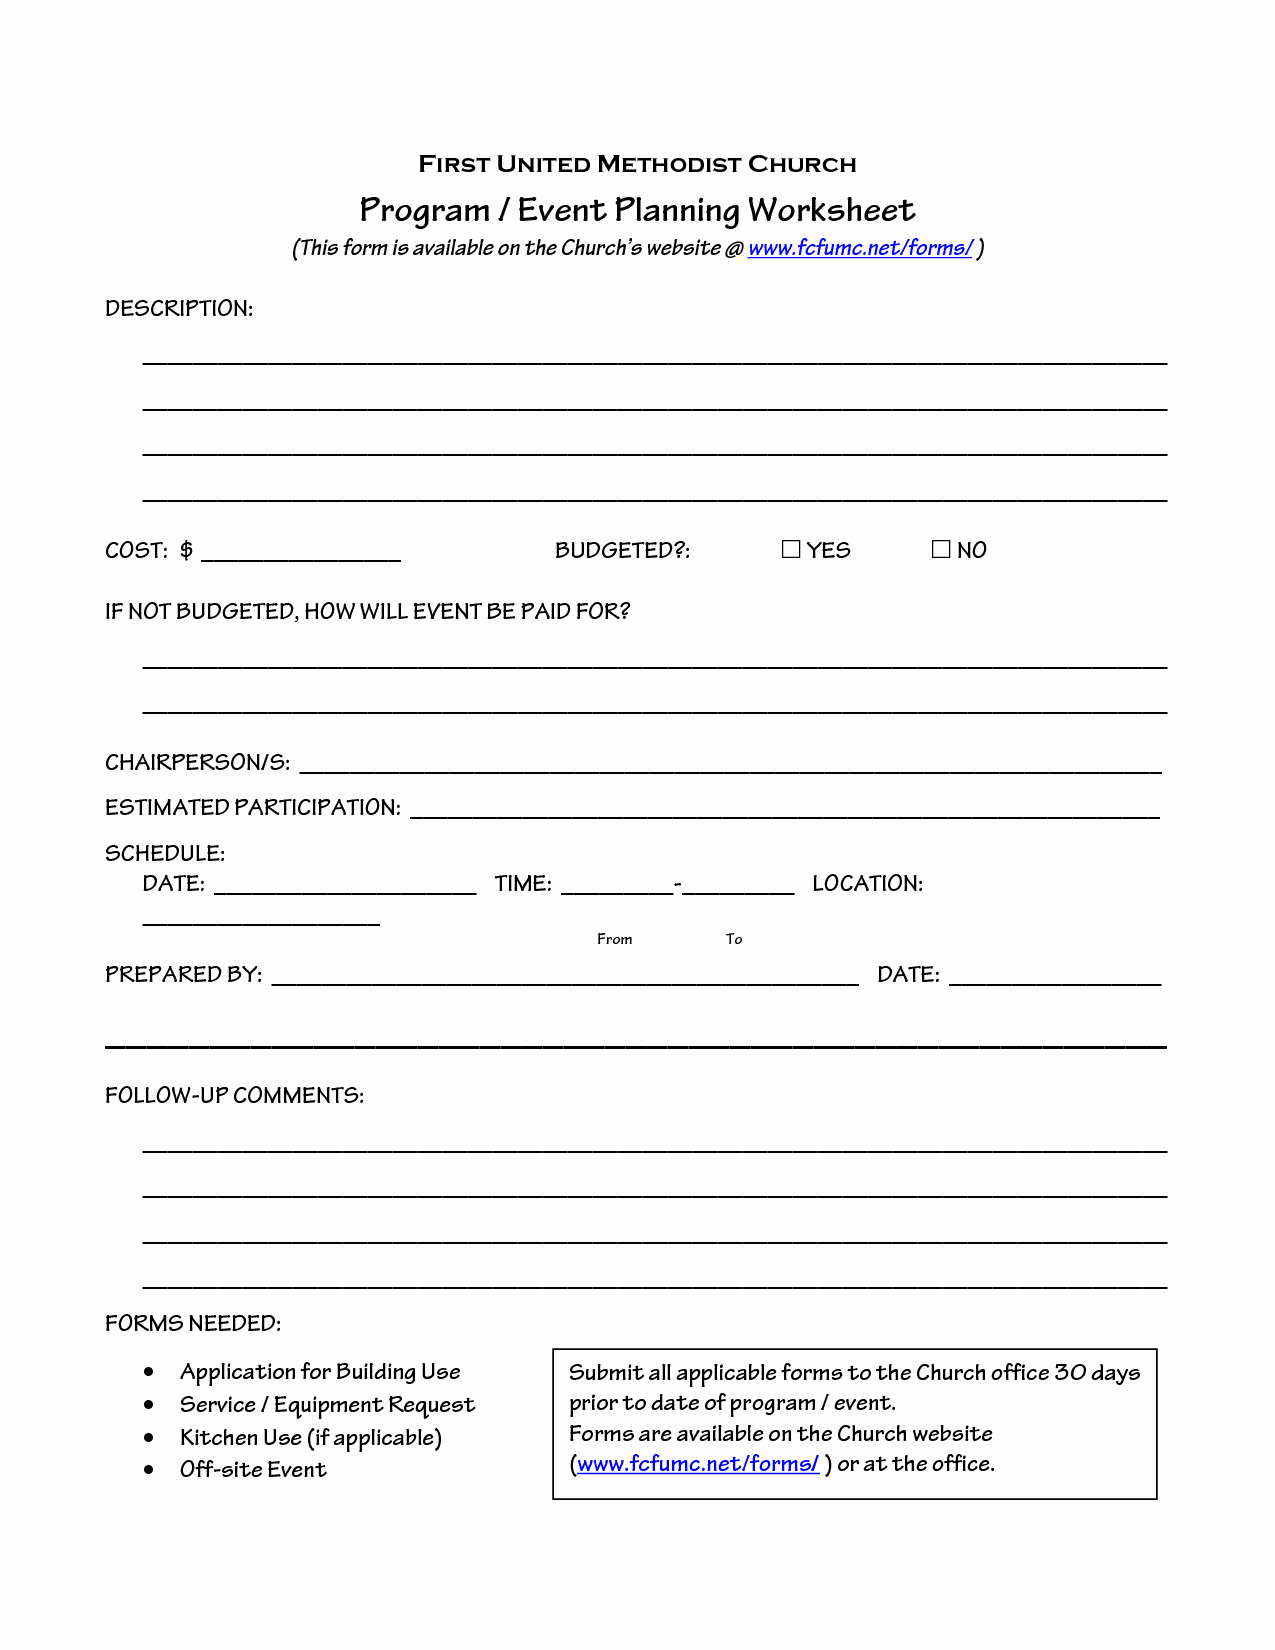 Event Planning Worksheet Template Beautiful Church event Planning Worksheet organize It